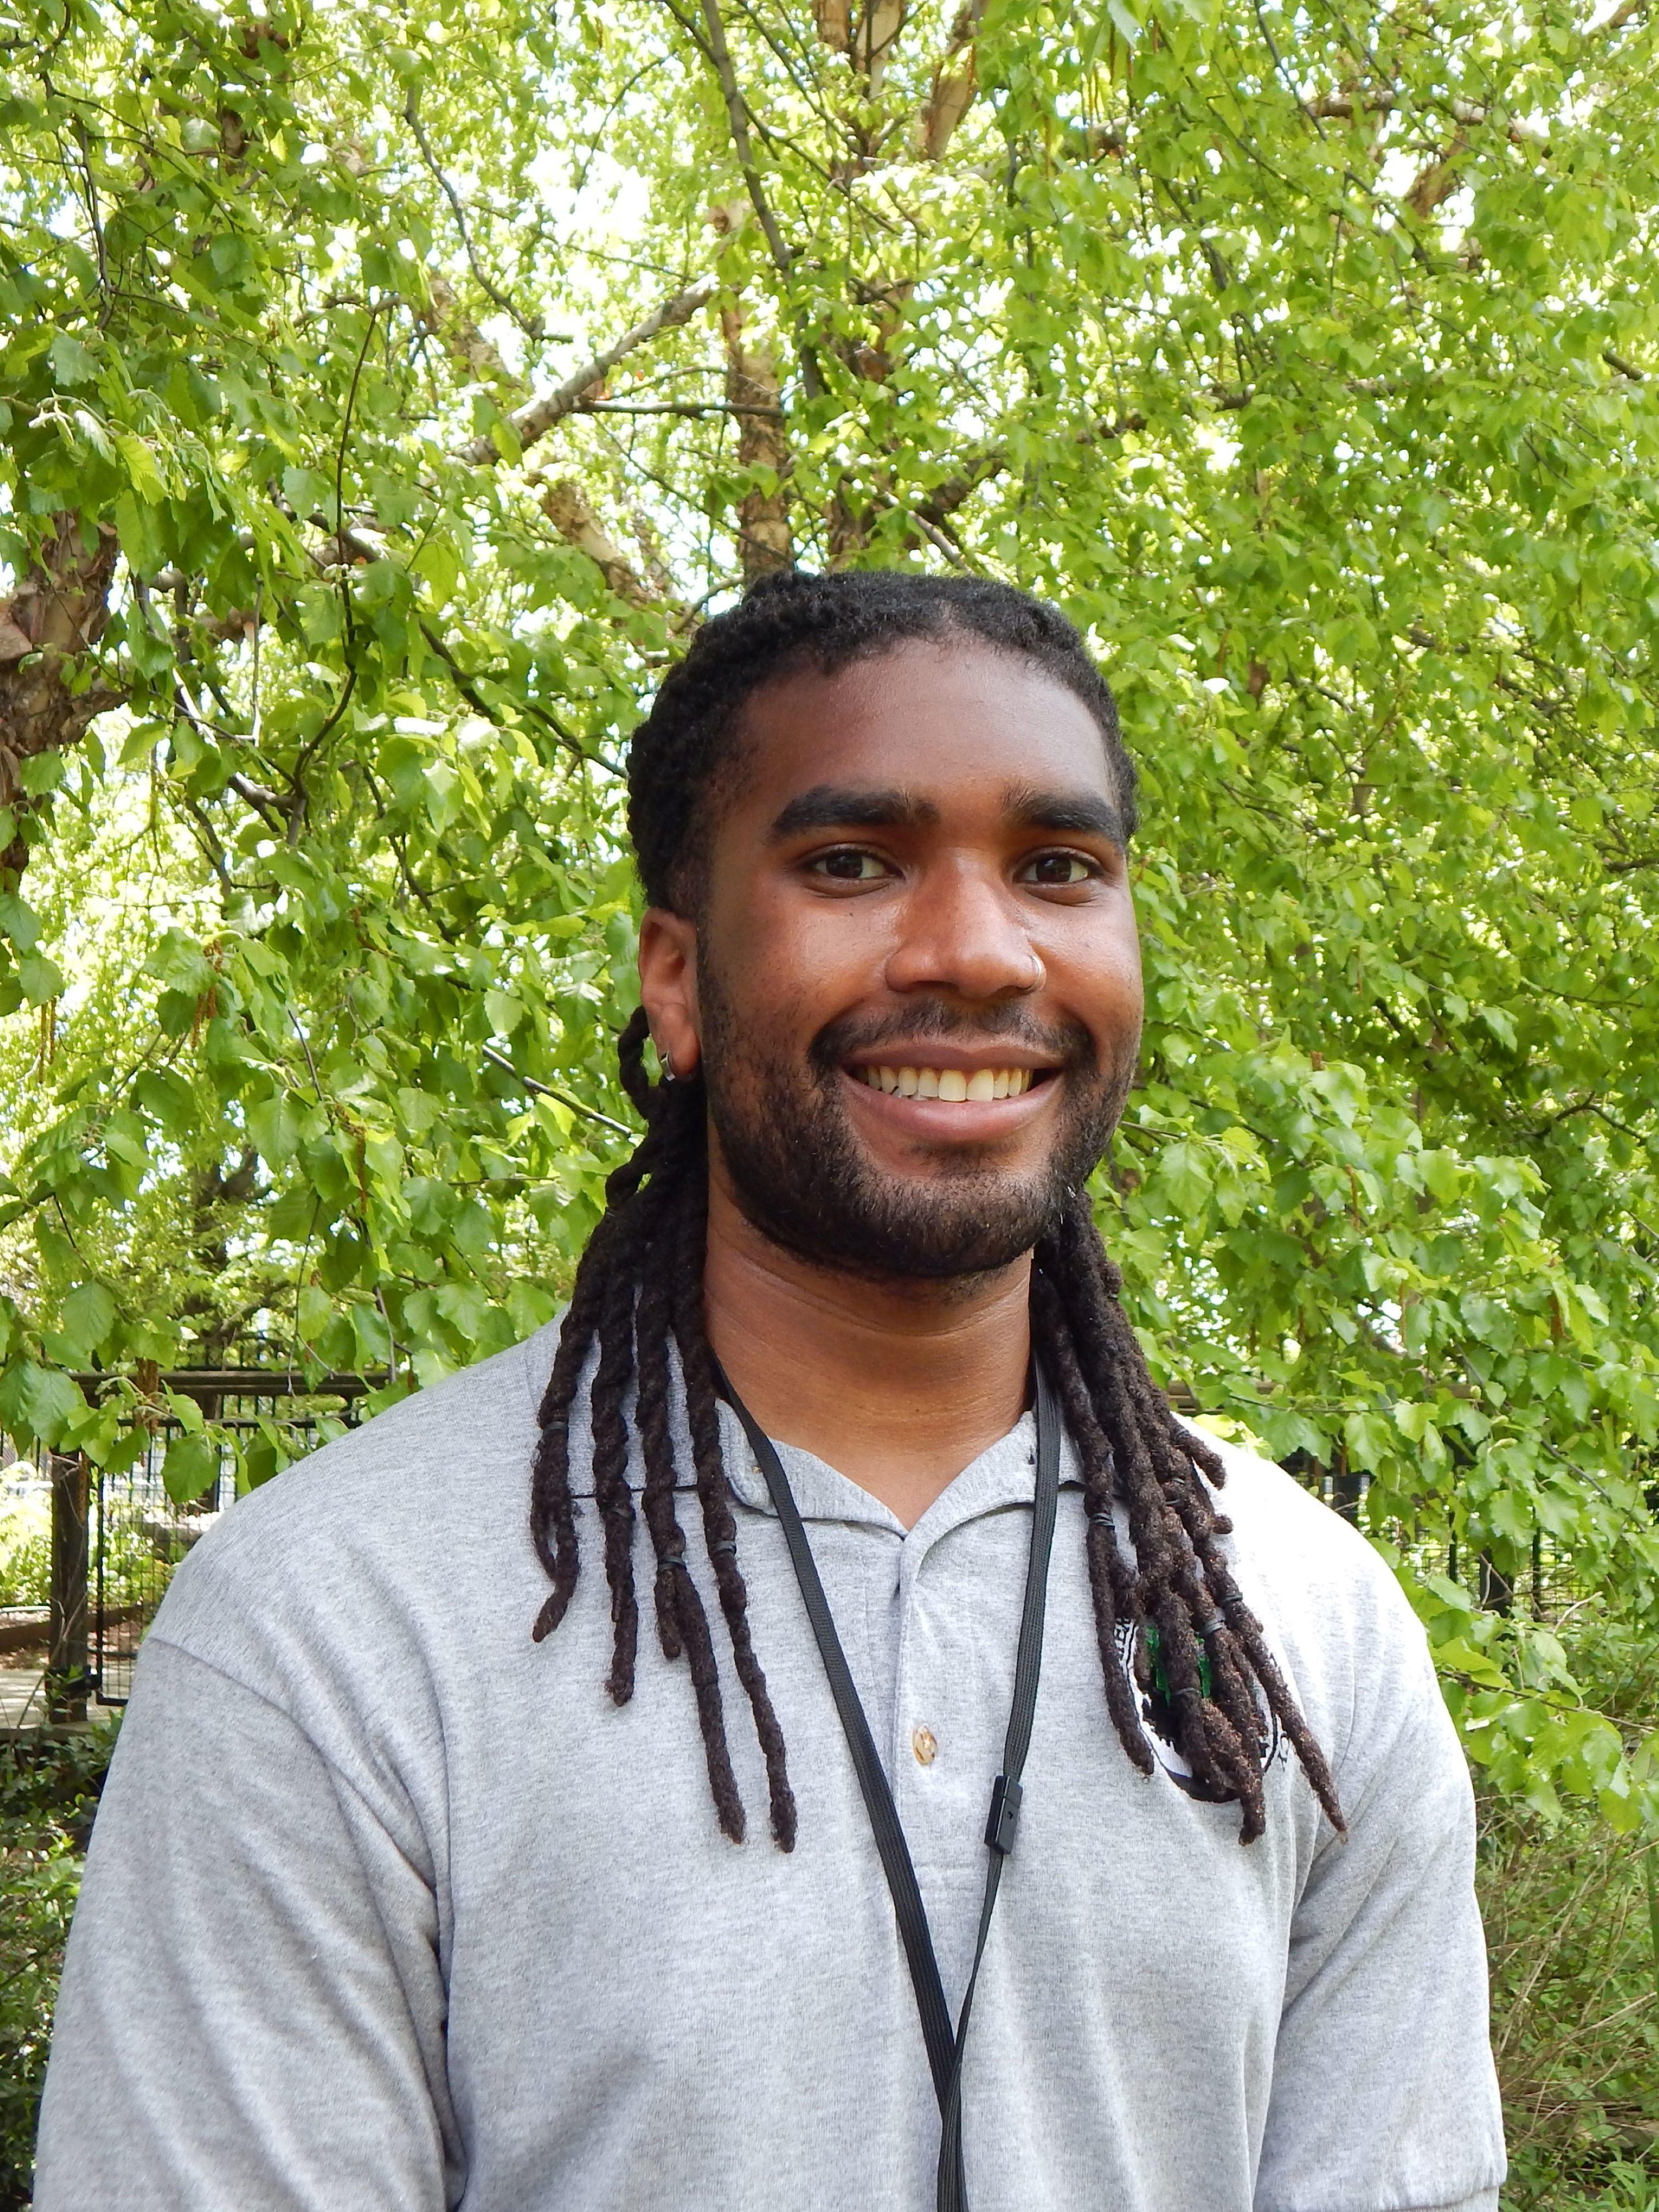 NYLP Coordinator